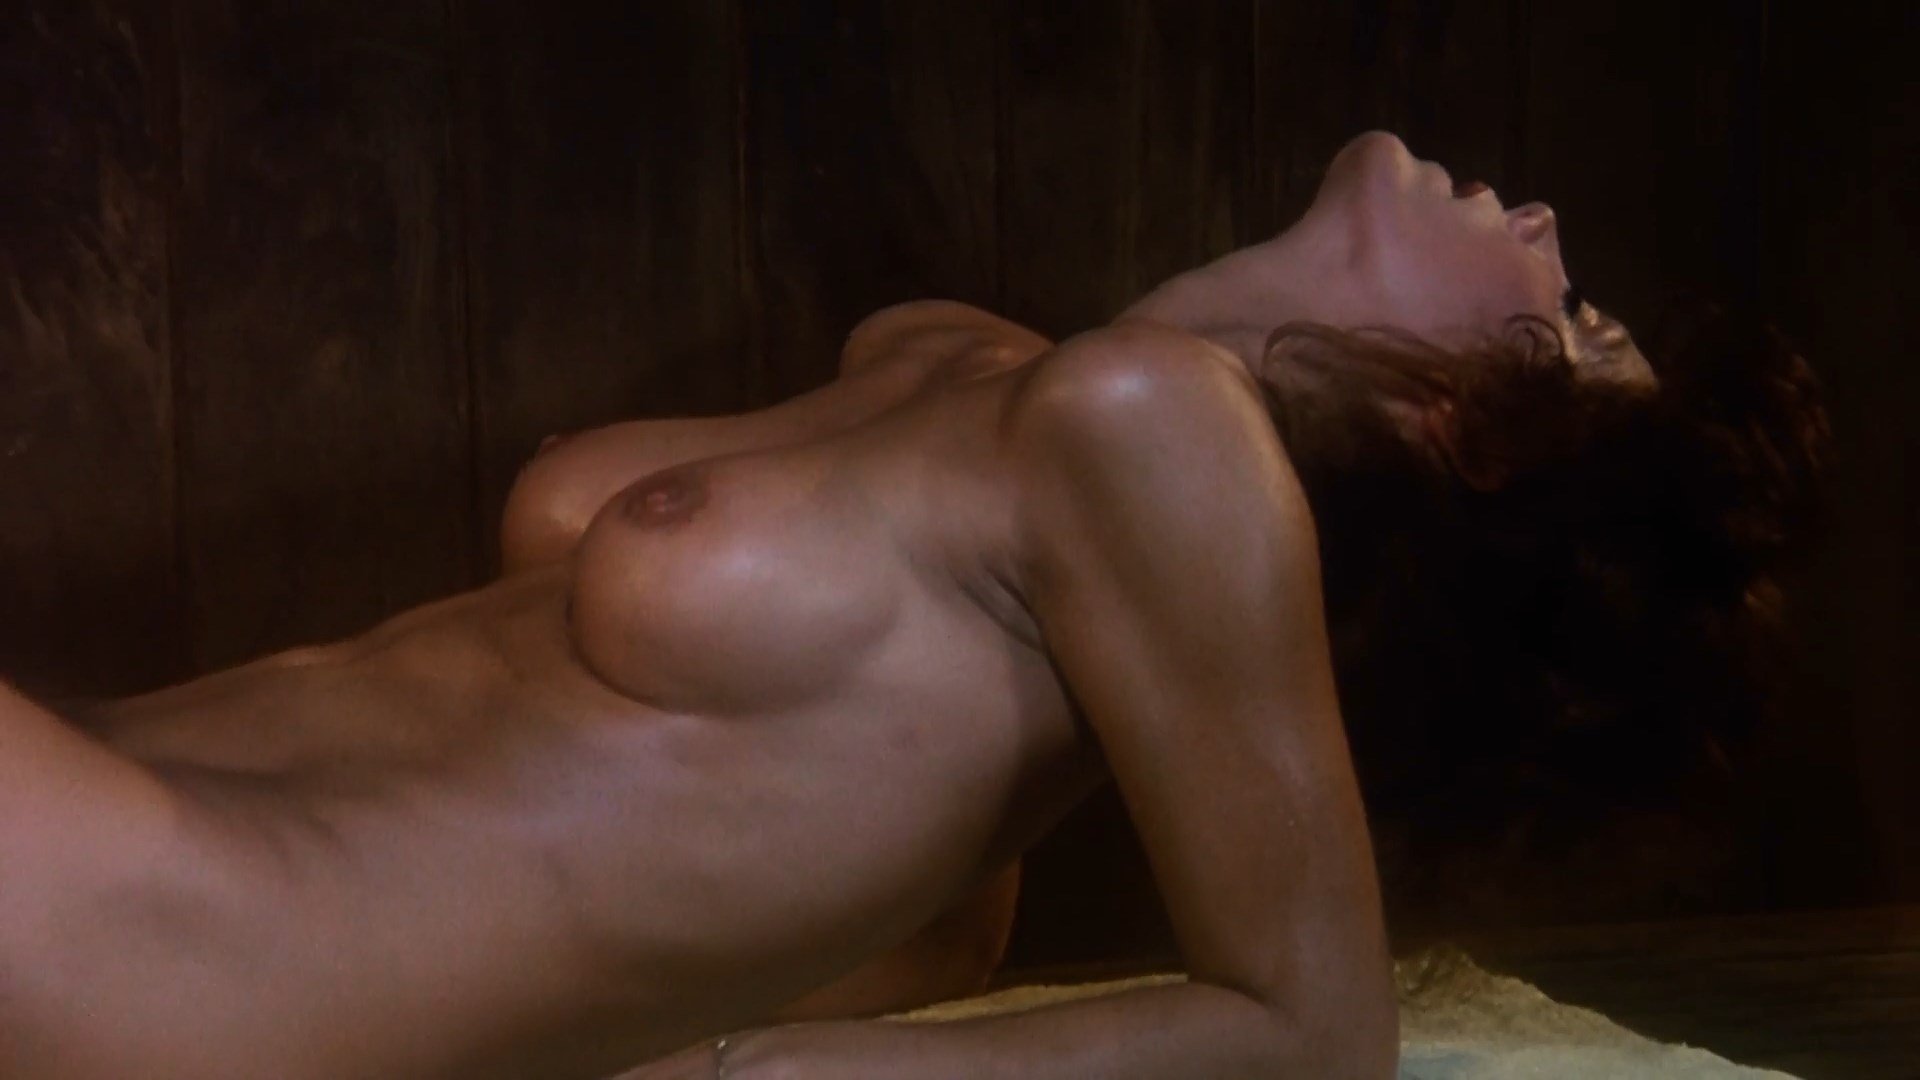 Ann archer topless, hardcore lesbian porn pussy licking